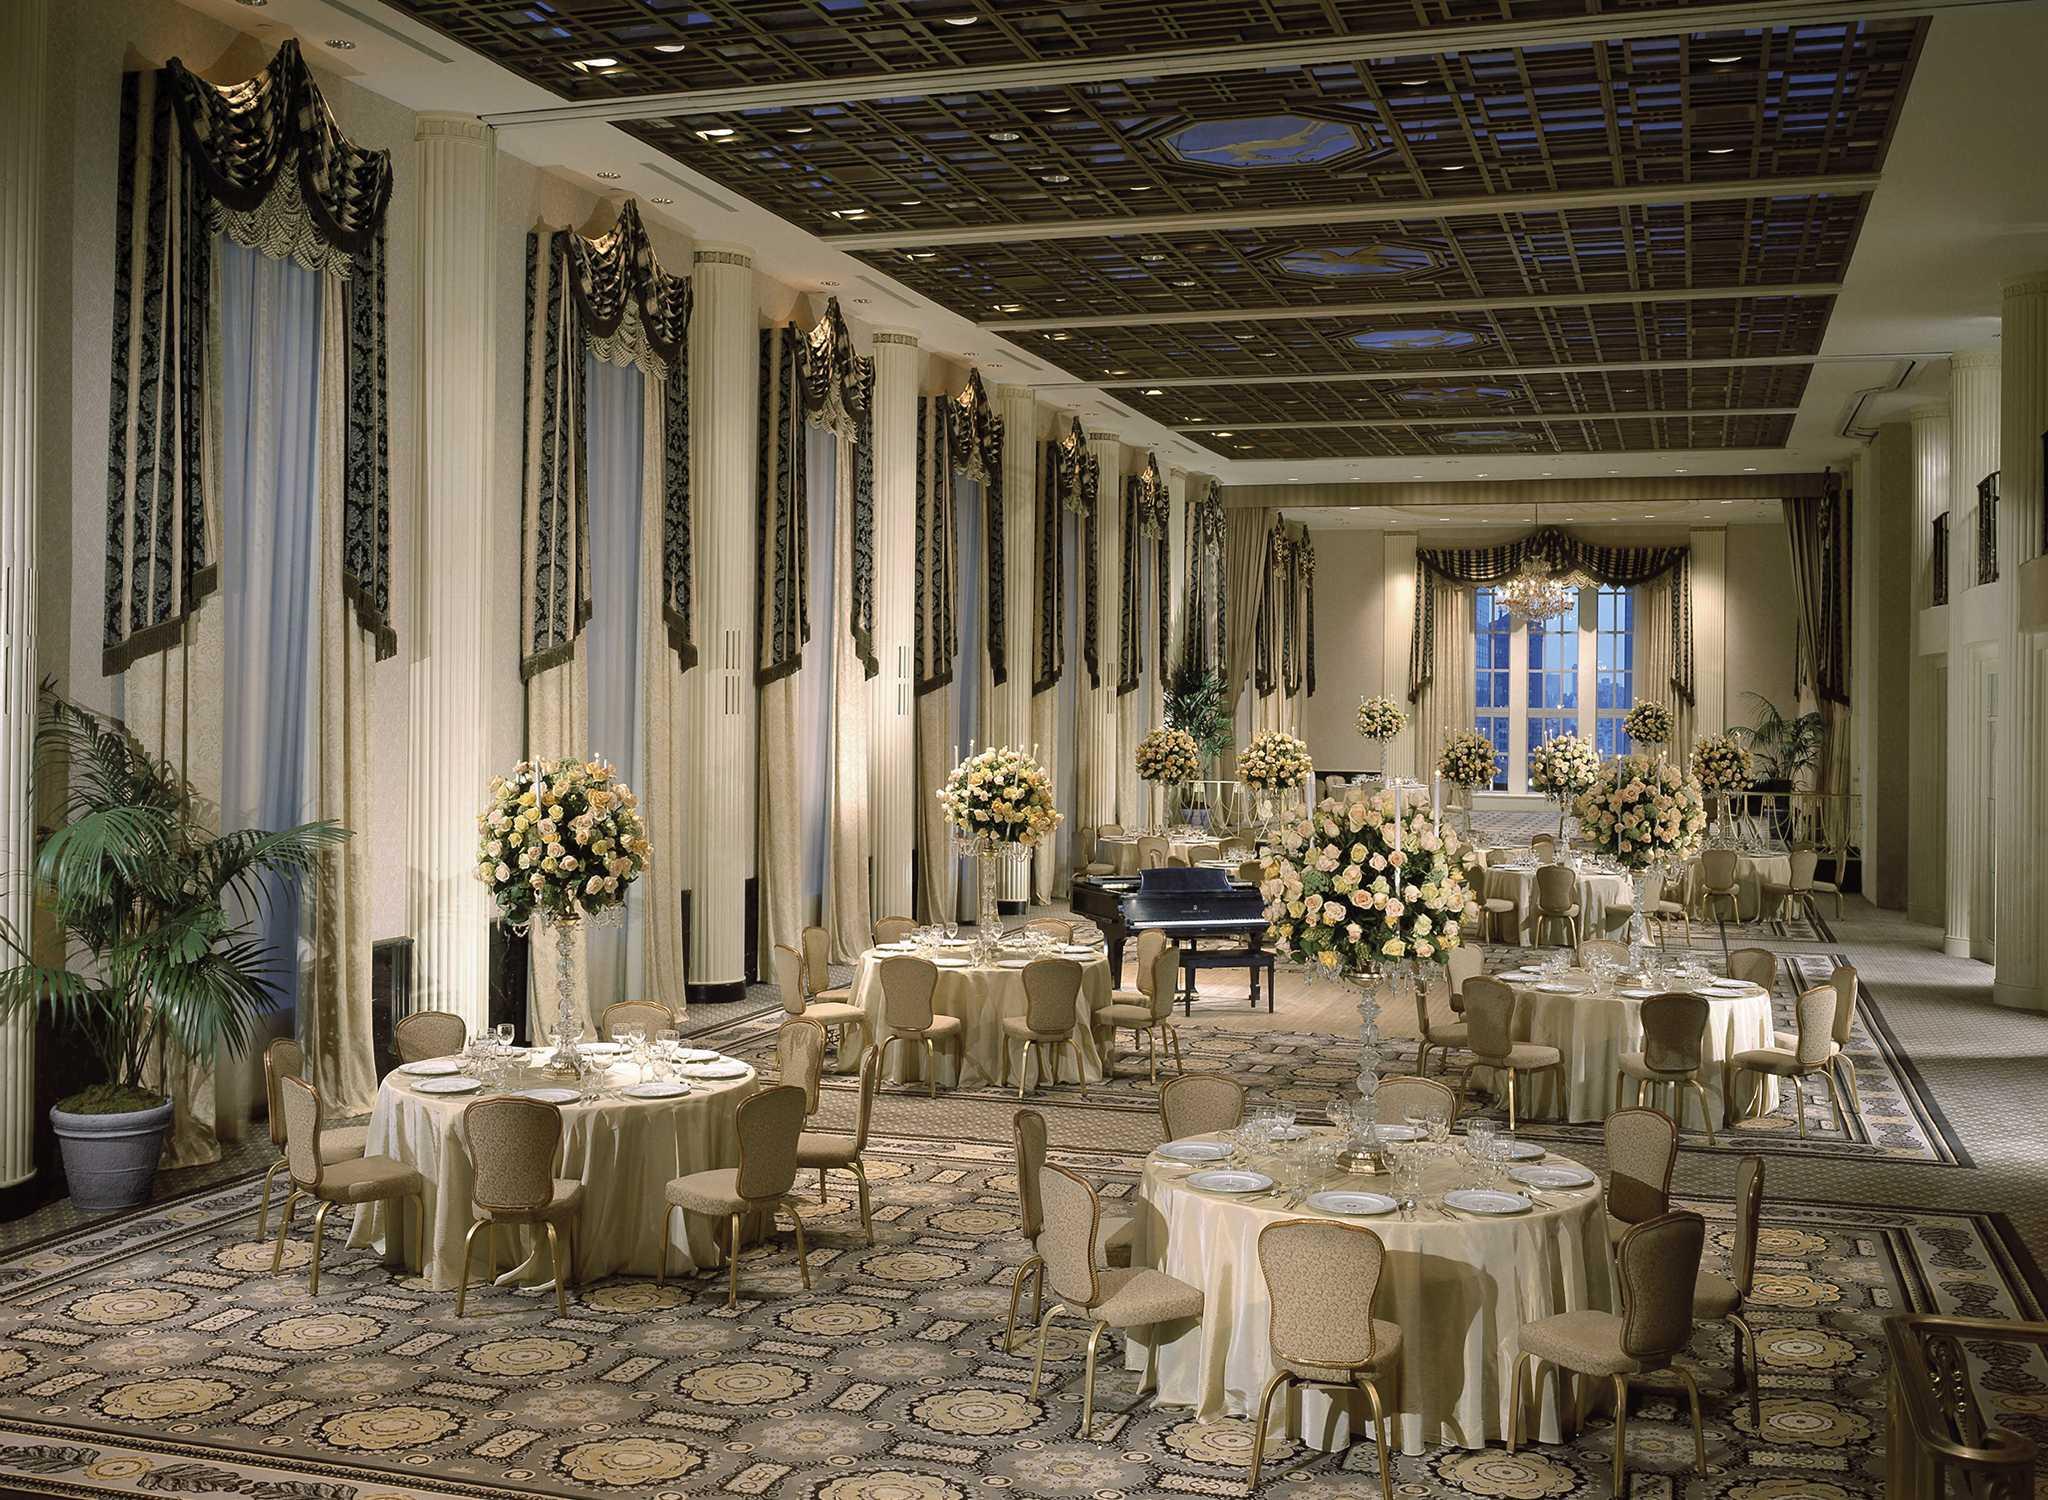 Waldorf astoria new york hotel de lujo de cinco estrellas for Hotel waldorf astoria